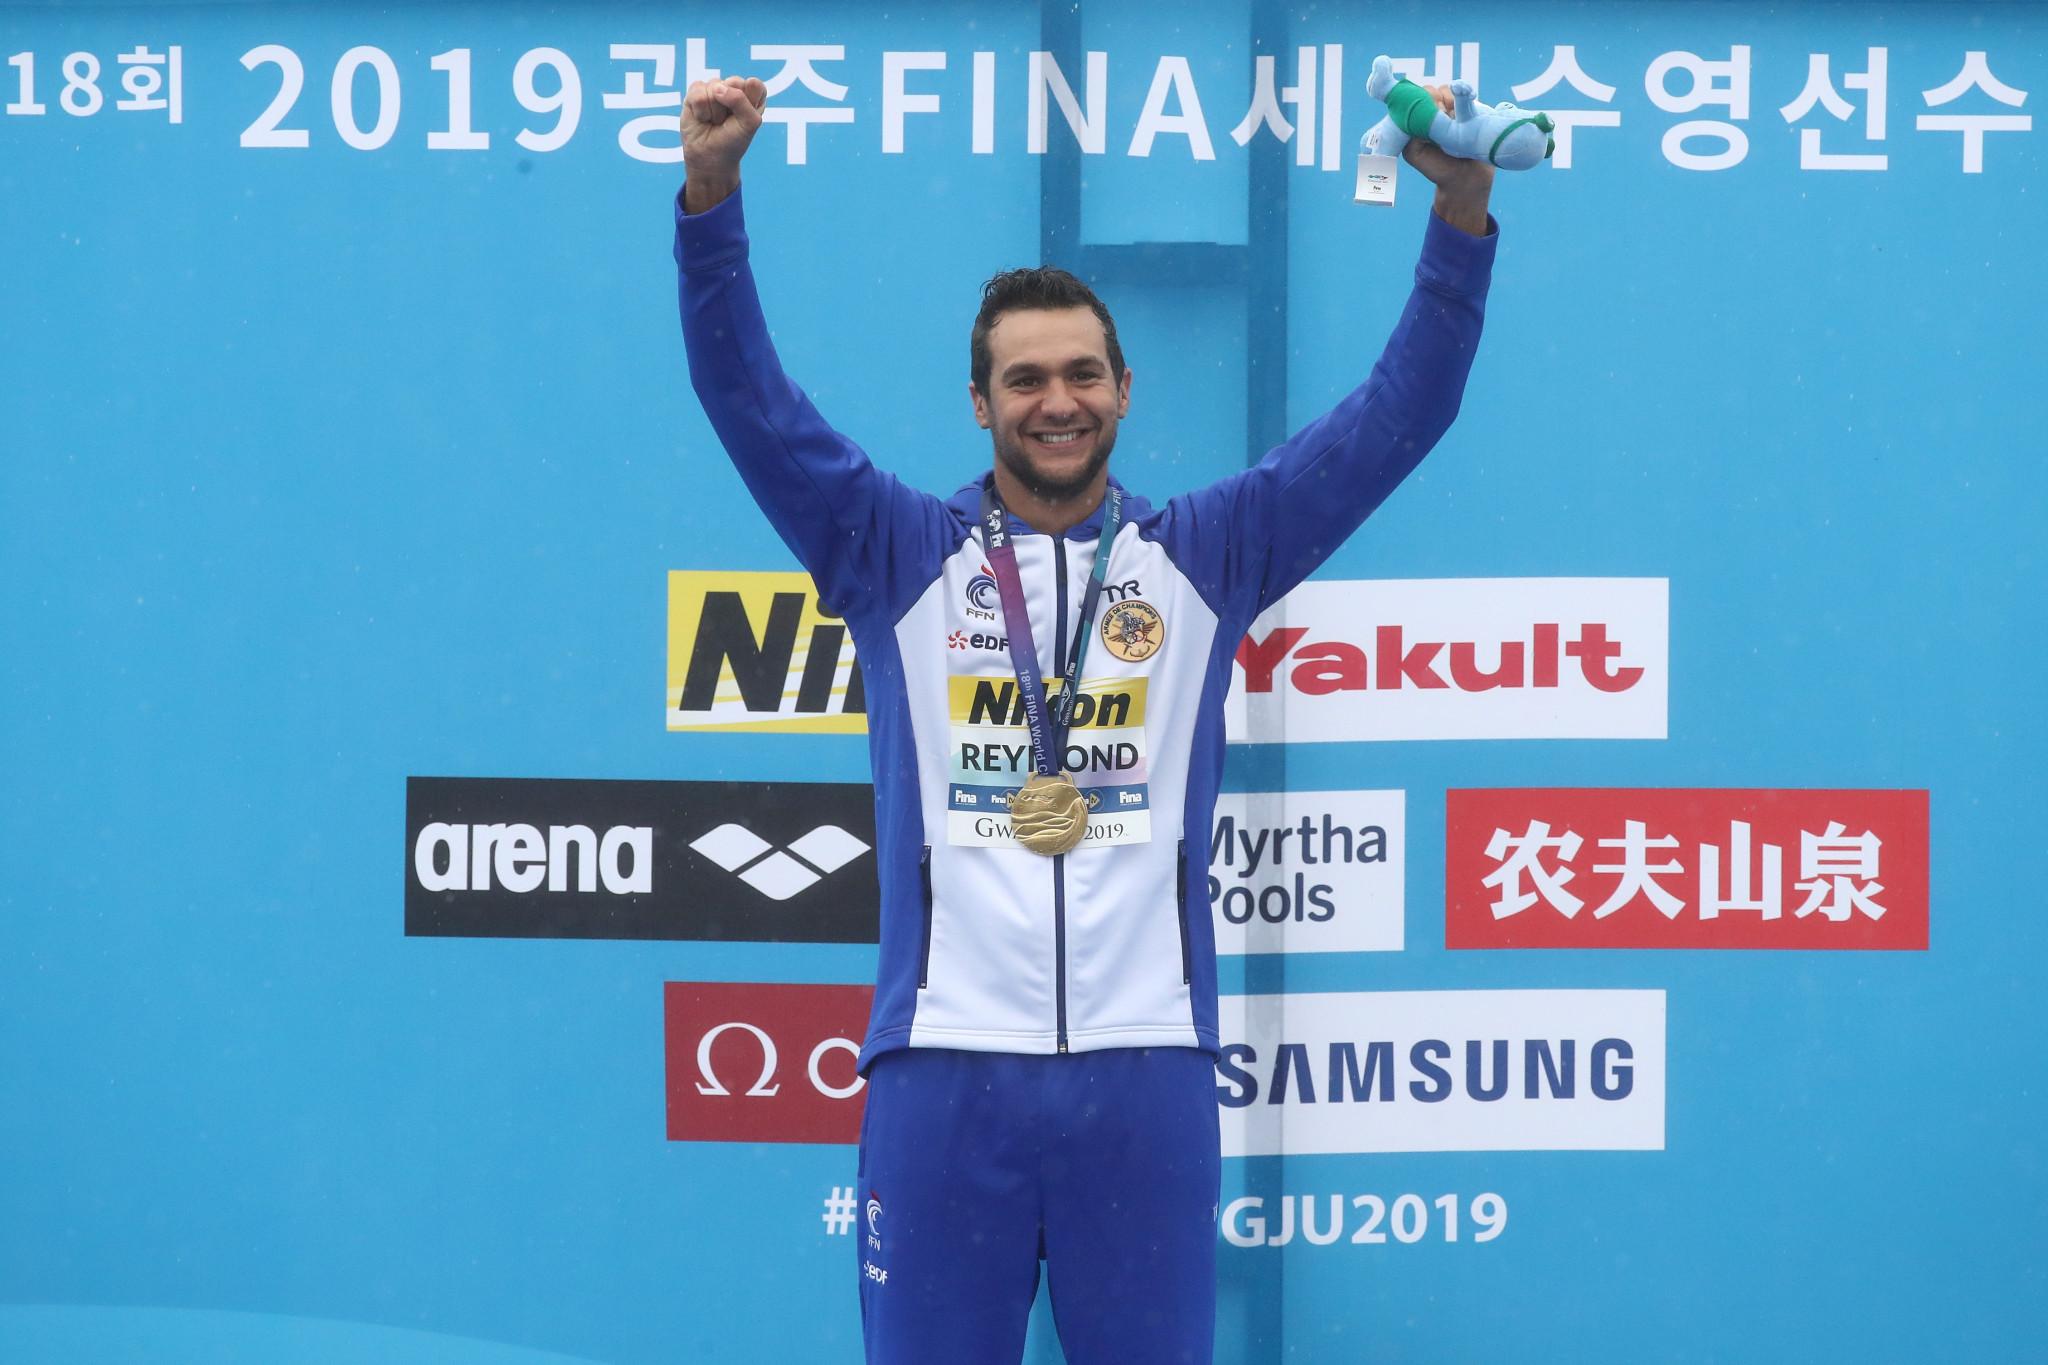 Twenty-five-kilometre two-time world champion Axel Reymond is set to compete in the second leg of the FINA UltraMarathon Swim Series ©Getty Images